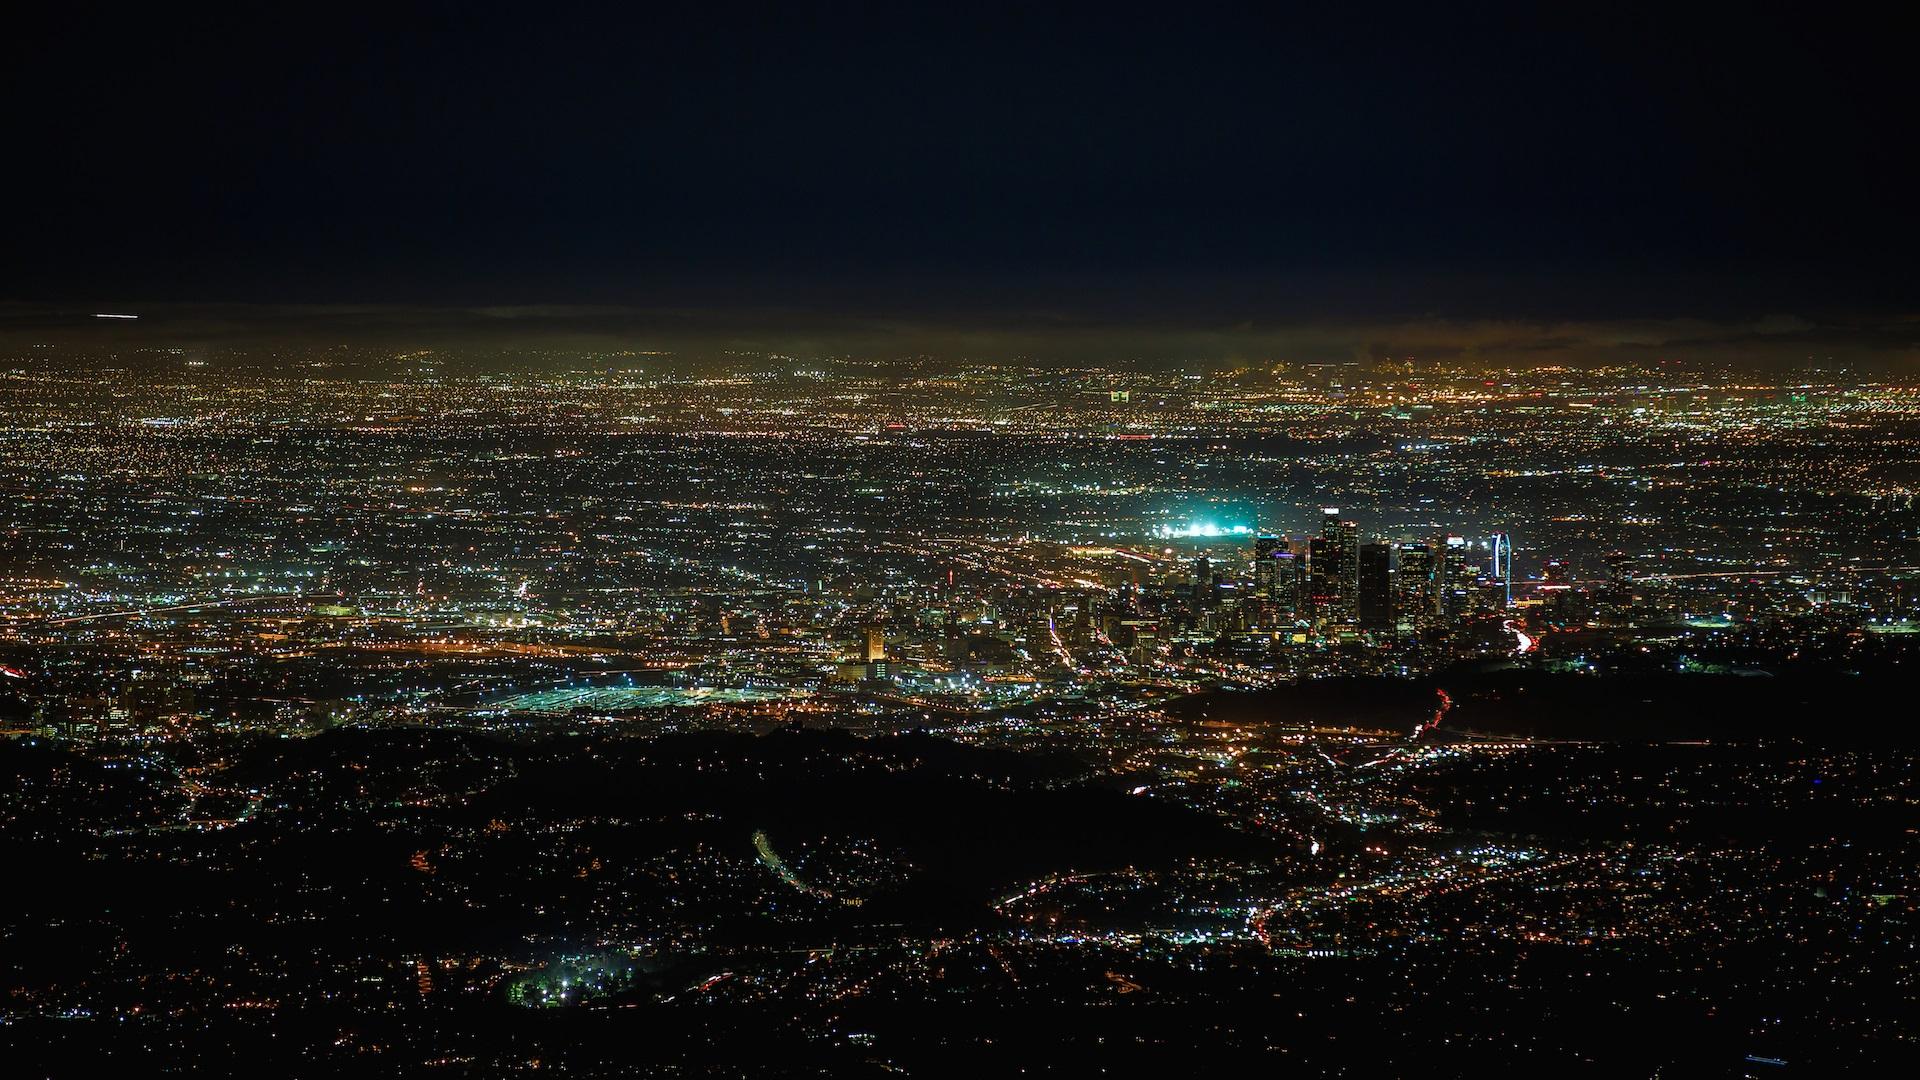 Wallpaper America, California, Night City, Lights, - Los Angeles Night Stars , HD Wallpaper & Backgrounds